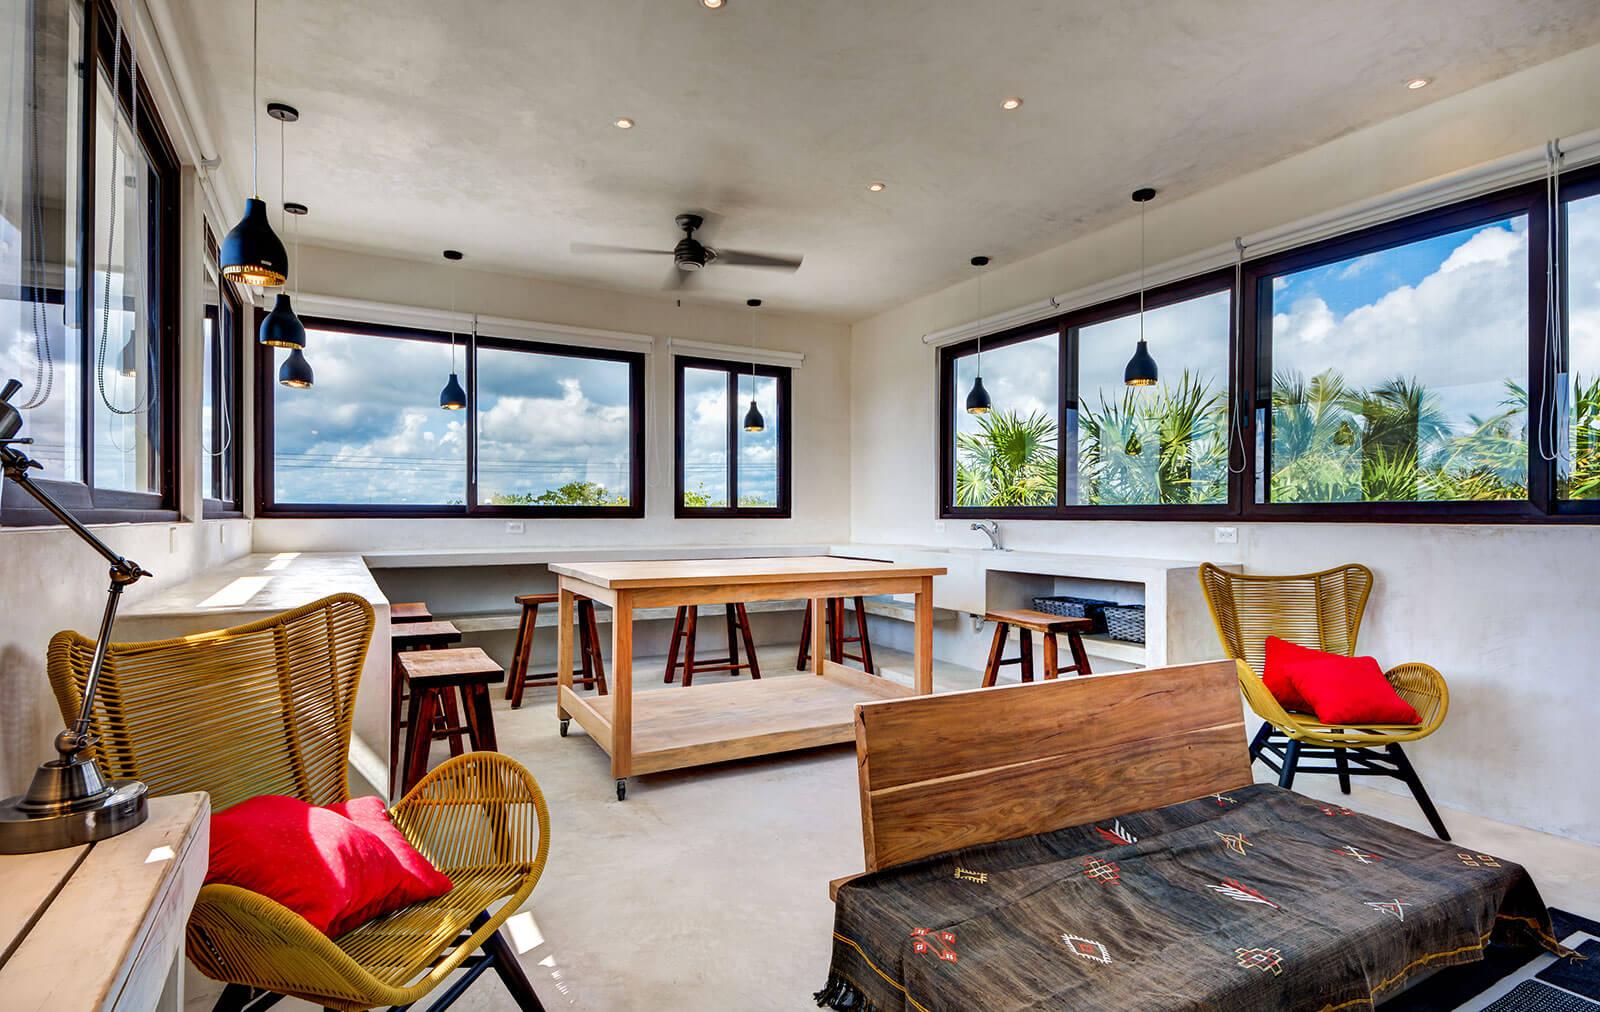 Maya_Luxe_Riviera_Maya_Luxury_Villas_Experiences_Tulum_Soliman_Bay_5_Bedrooms_16.jpg